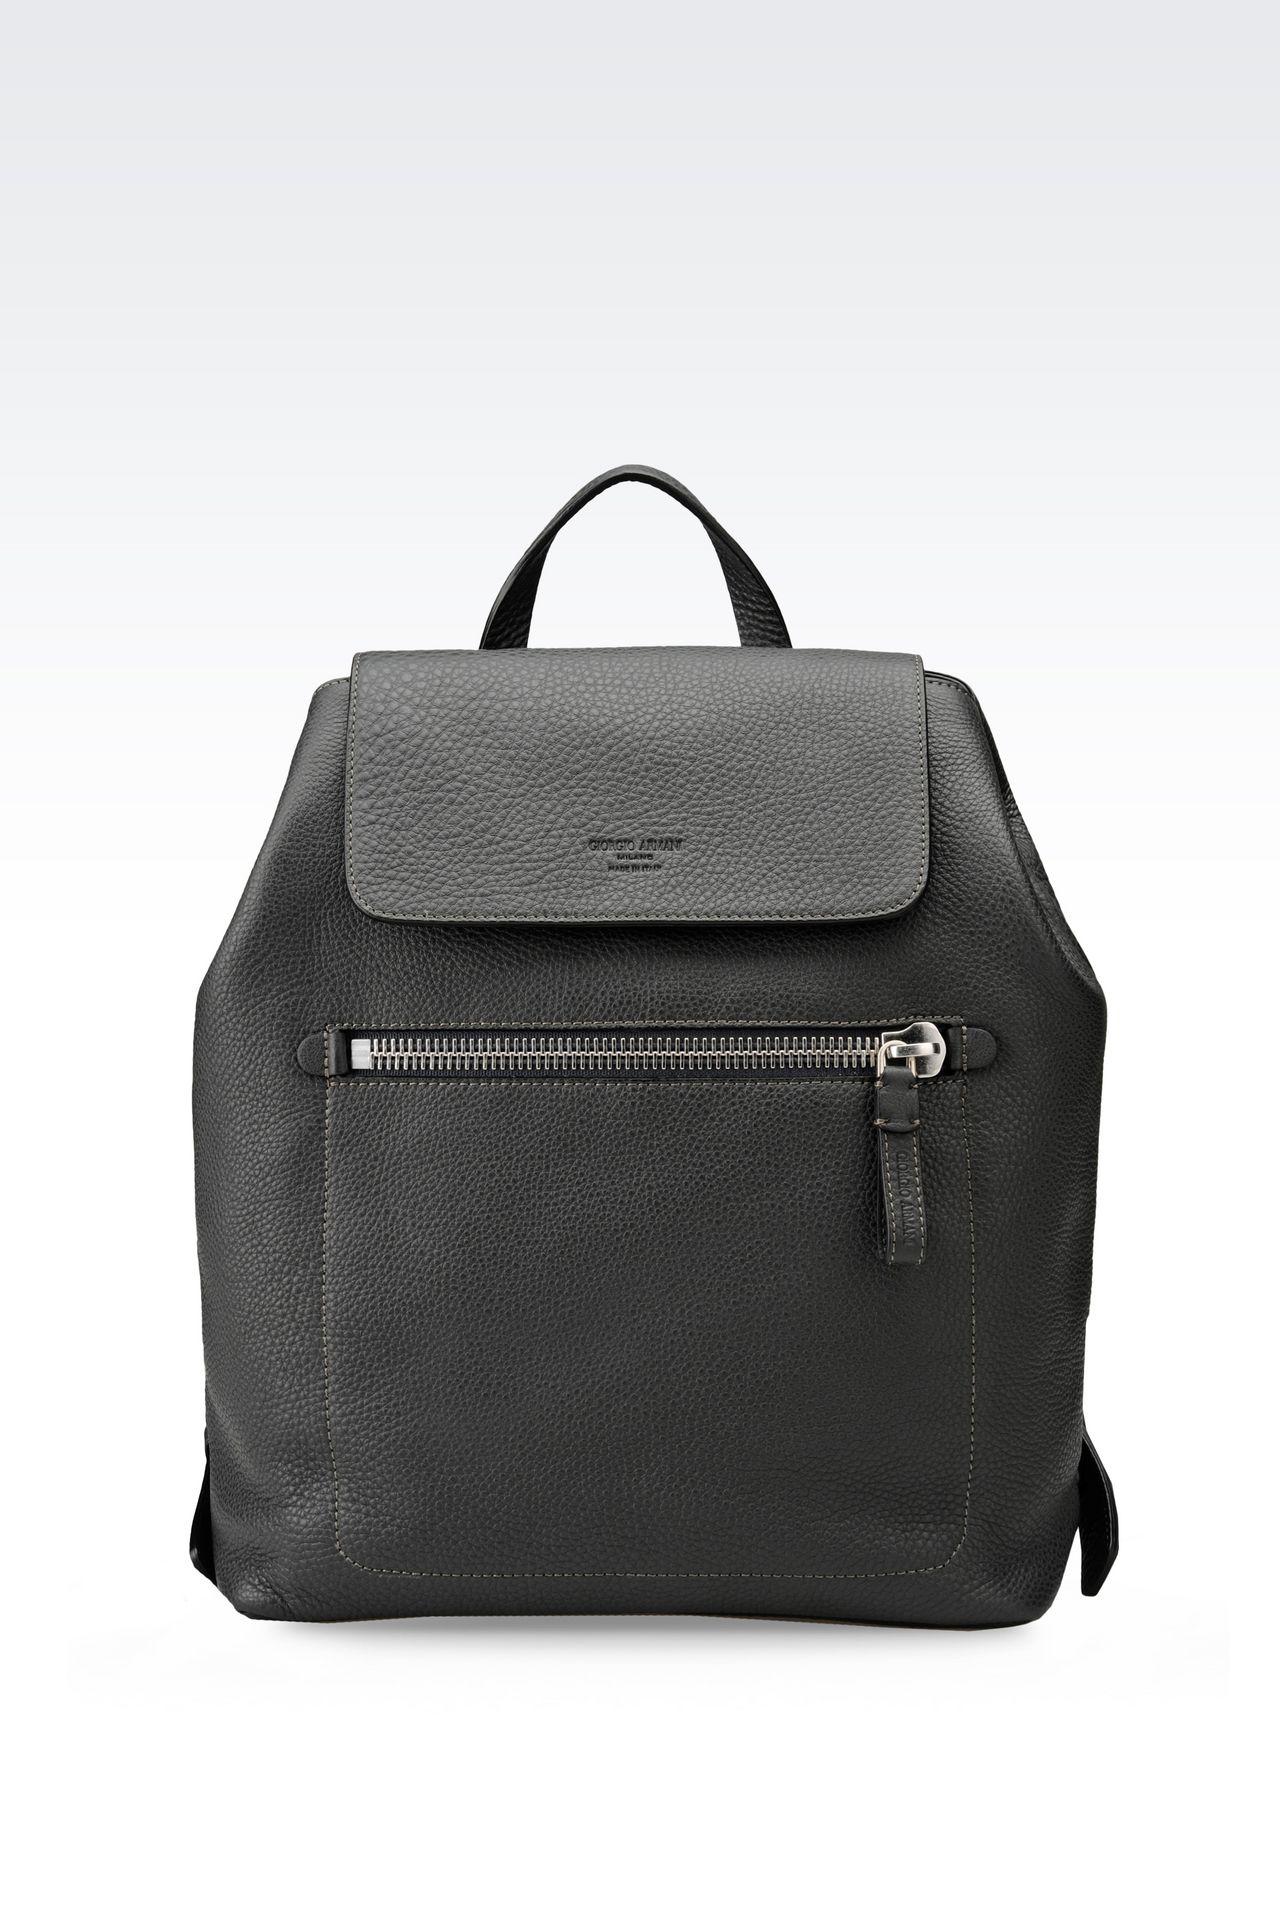 BACKPACK IN PRINTED CALFSKIN: Backpacks Men by Armani - 0